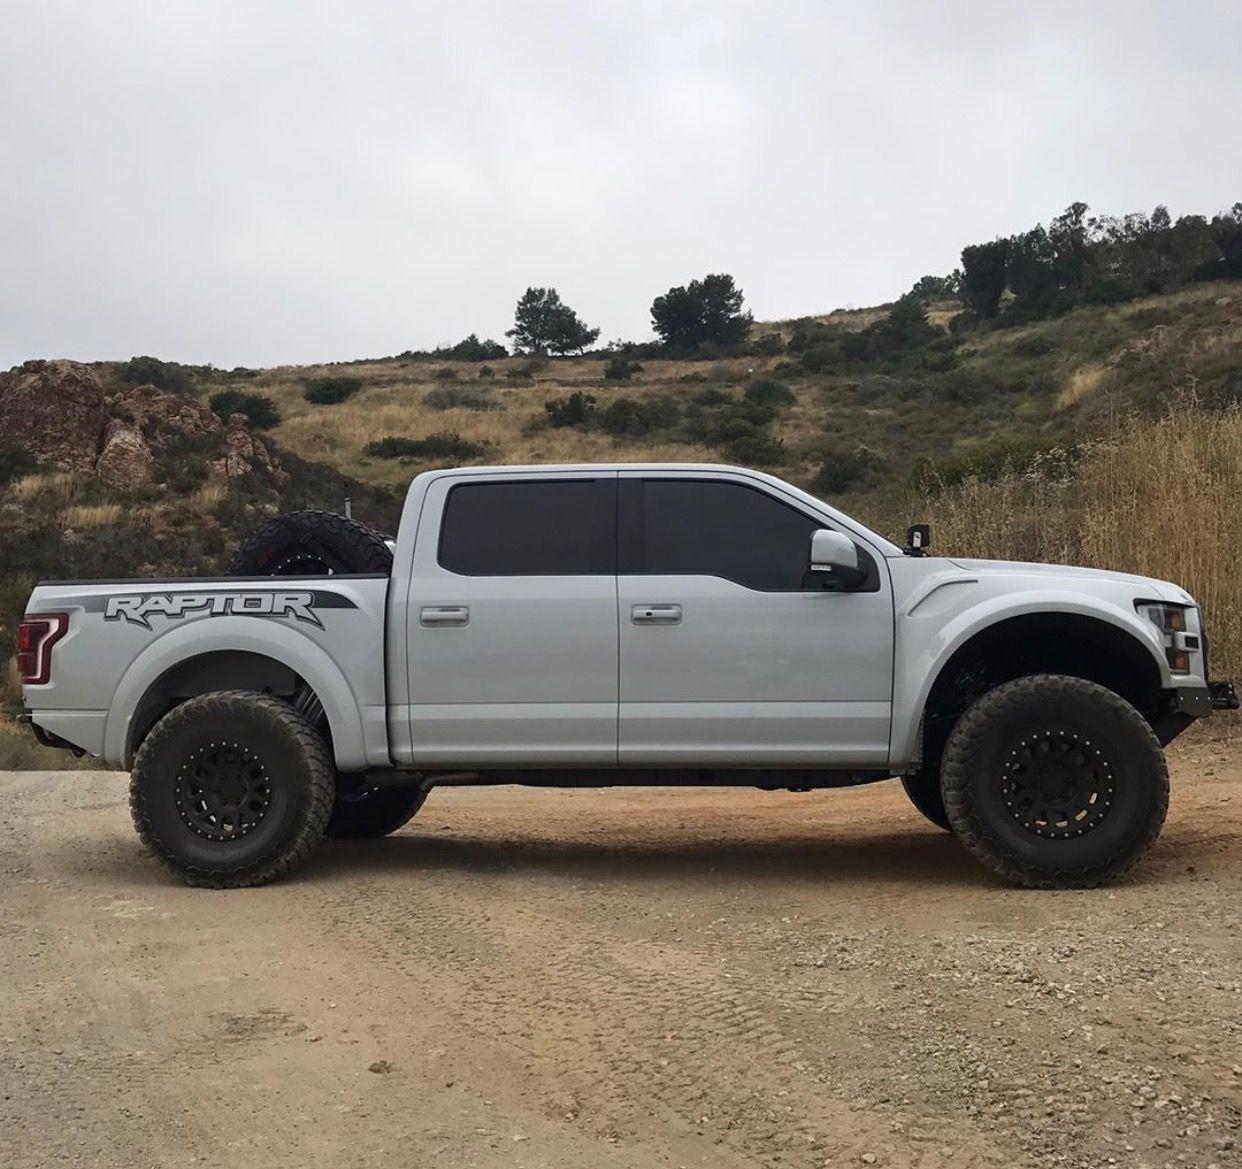 Ford Raptor Ford Raptor Ford Raptor Truck Lifted Ford Trucks